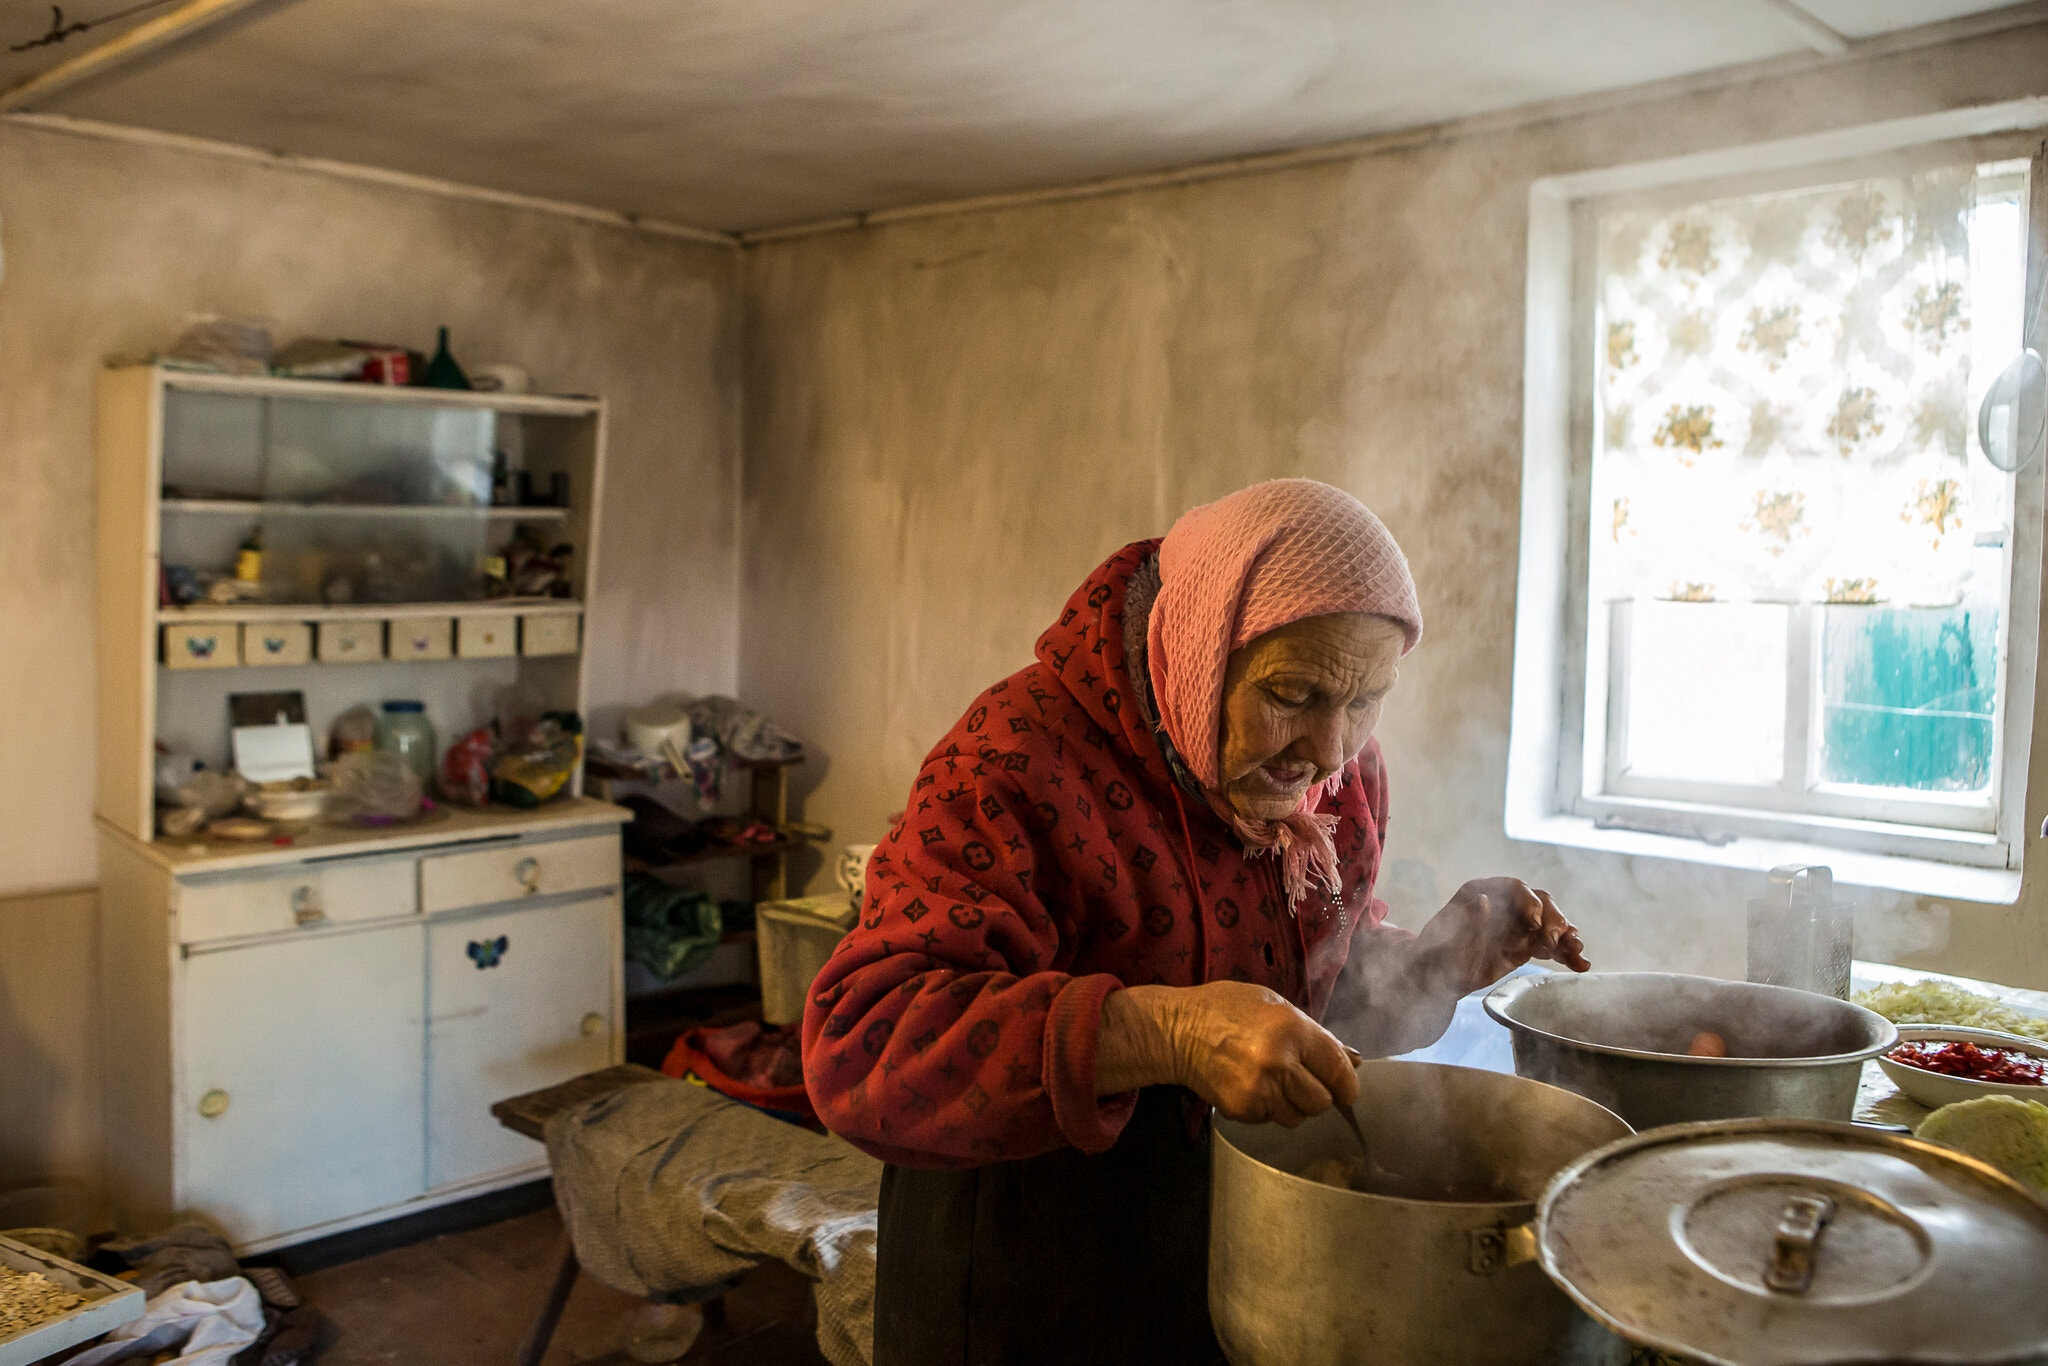 The New York Times опубликовала рецепт борща пенсионерки из Житомирской области